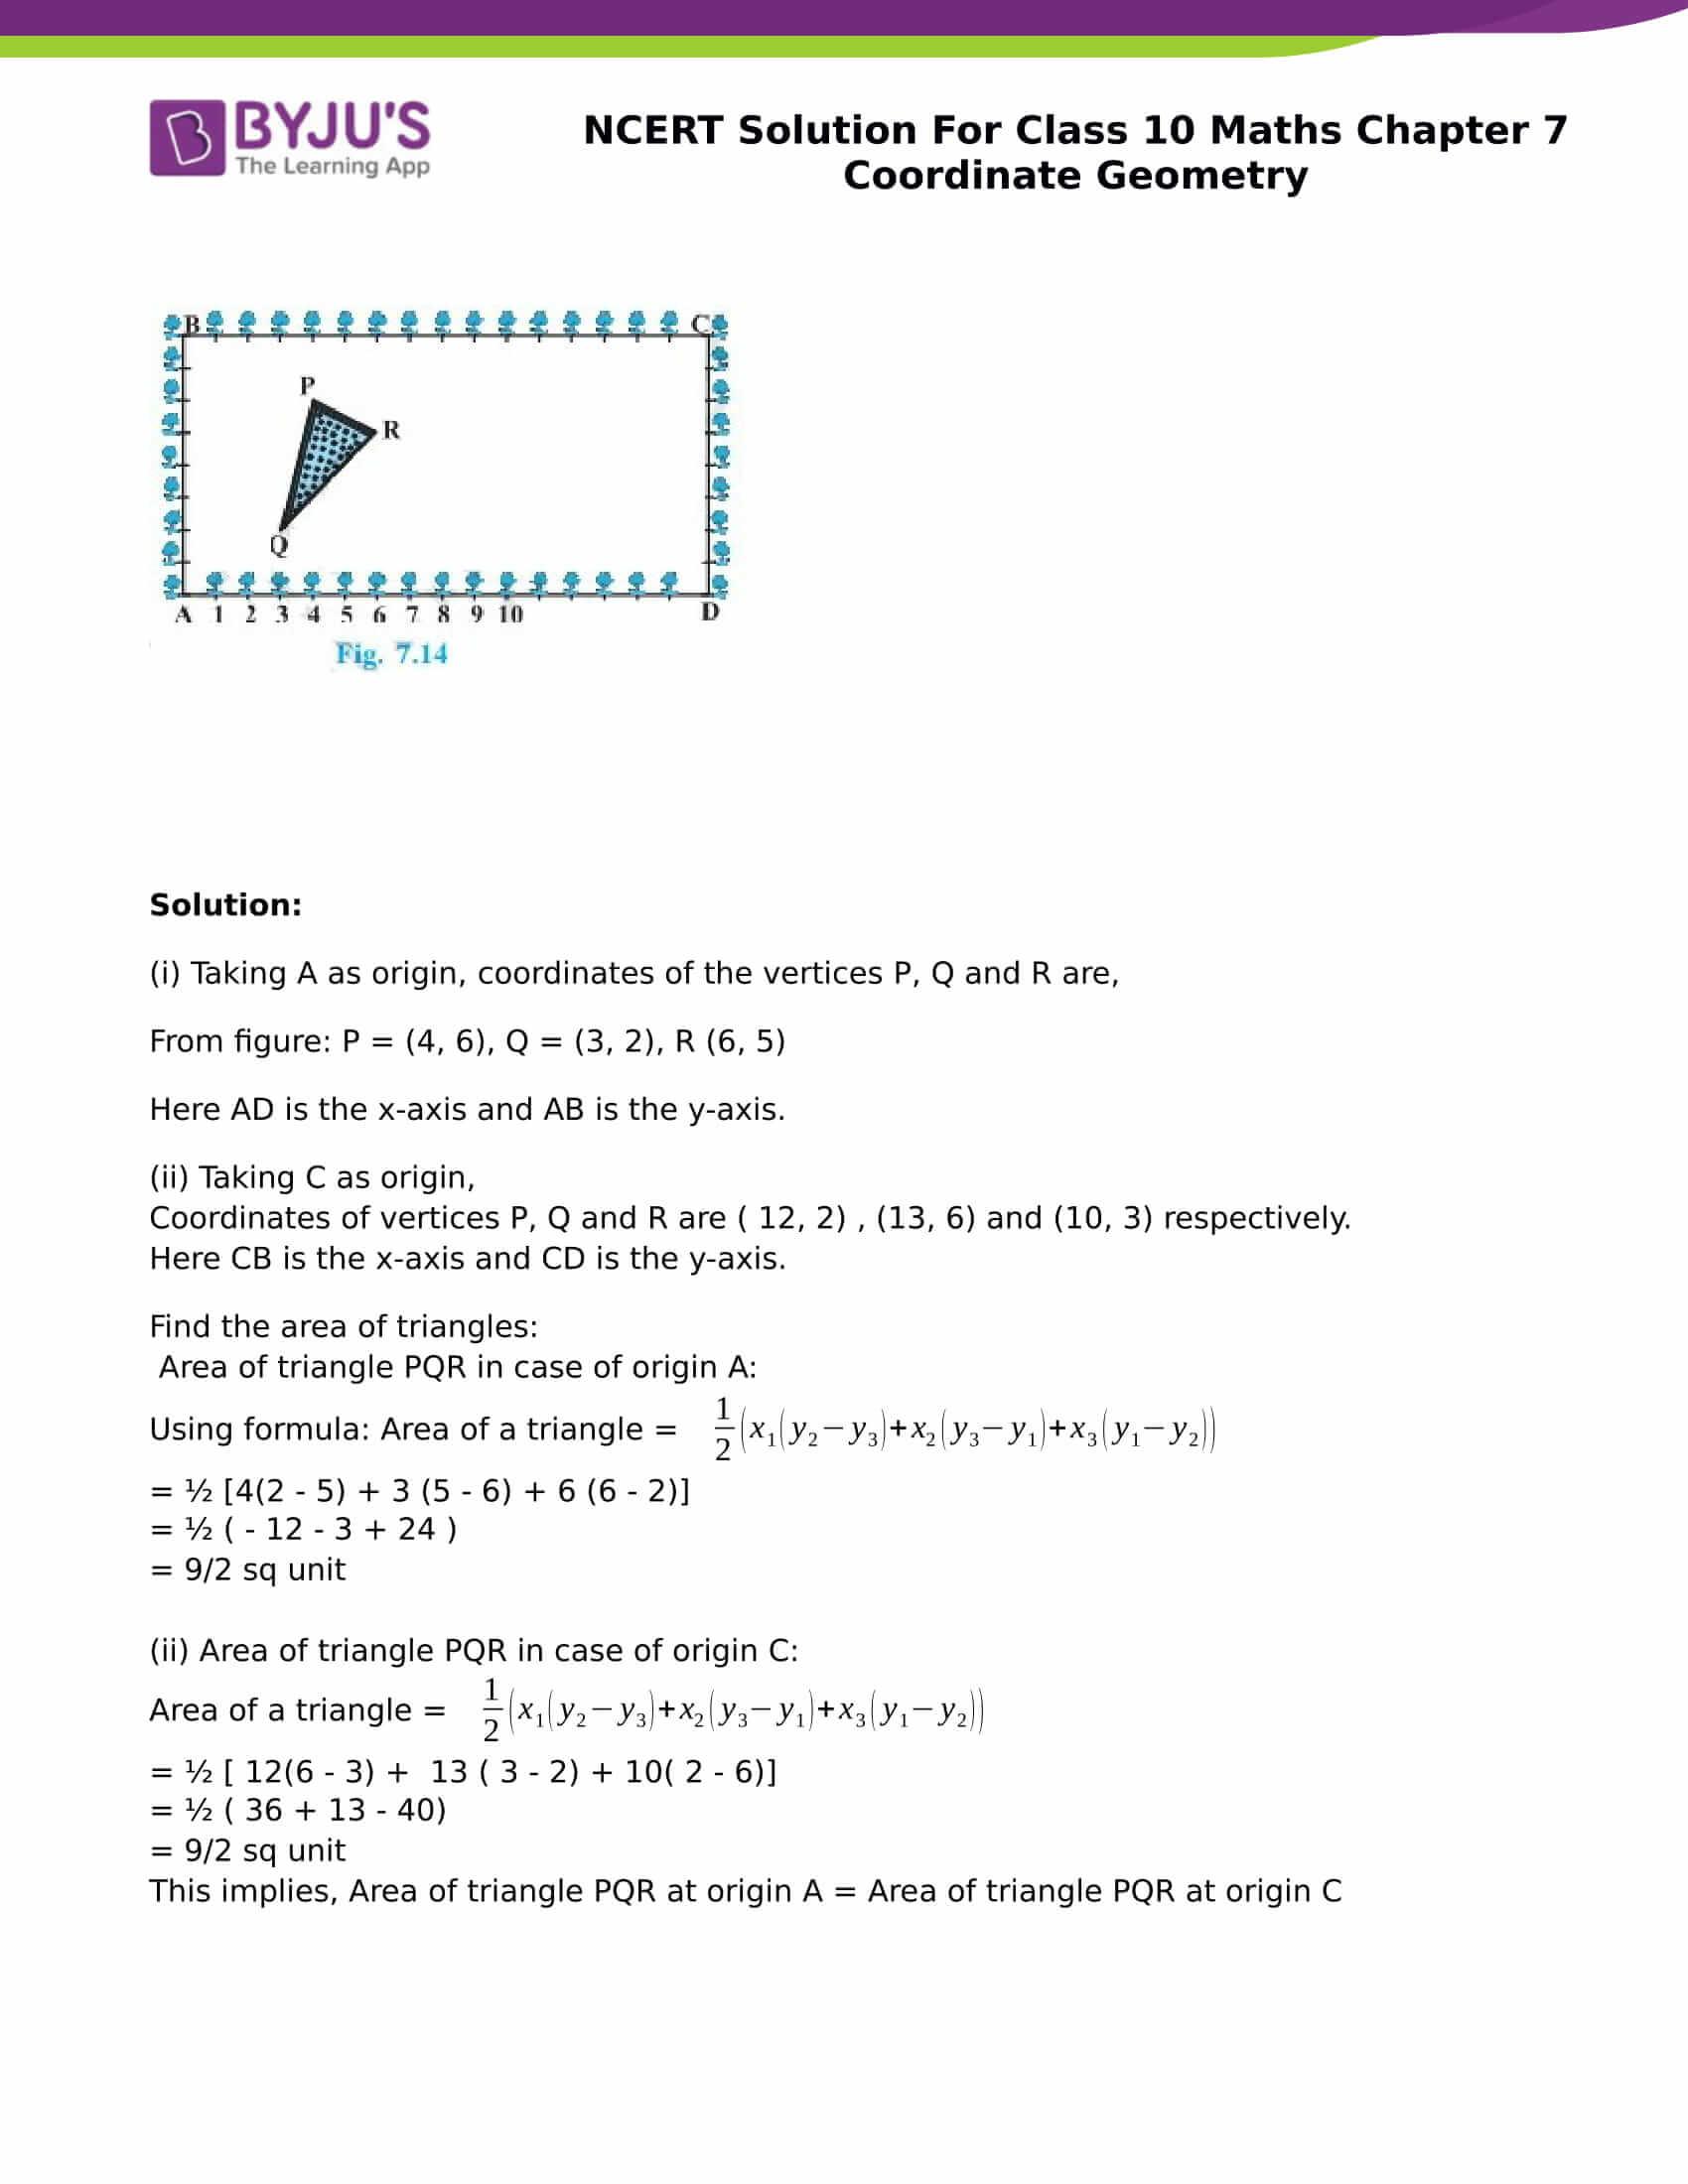 NCERT Solution for class 10 Maths chapter 7 Coordinate Geometry Part 26